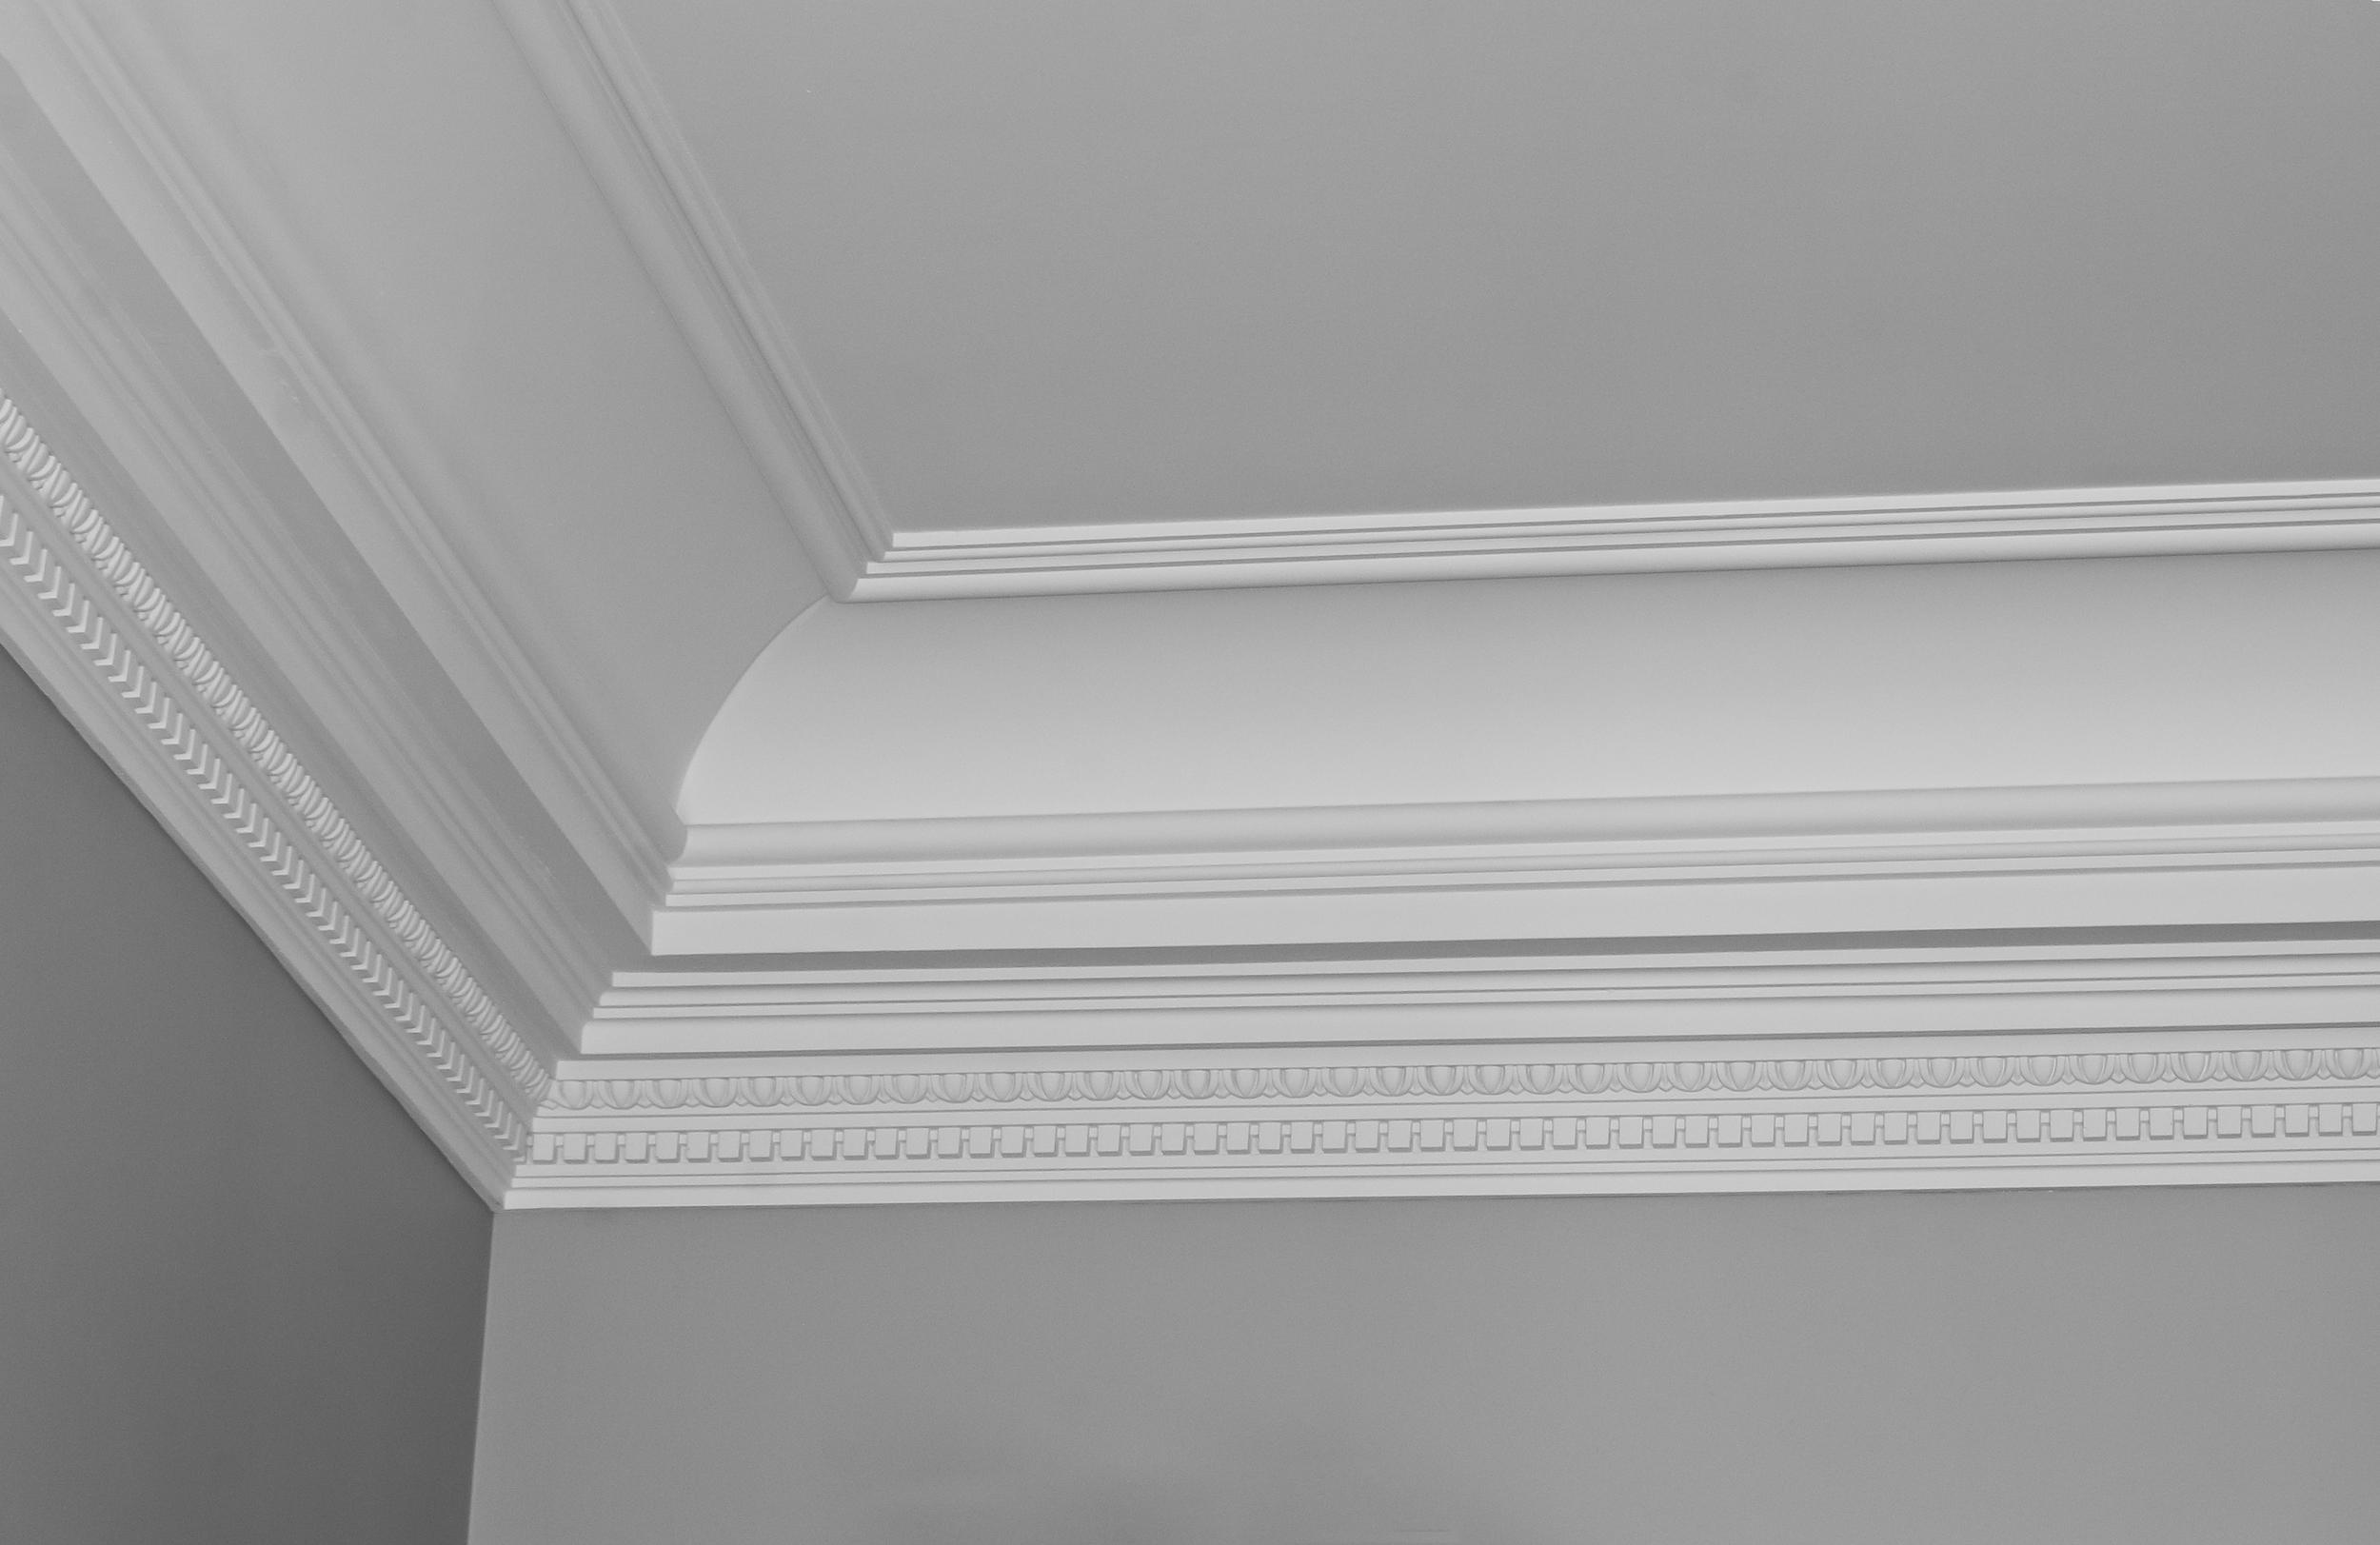 20100128-Interior dinning room crown-2.jpg